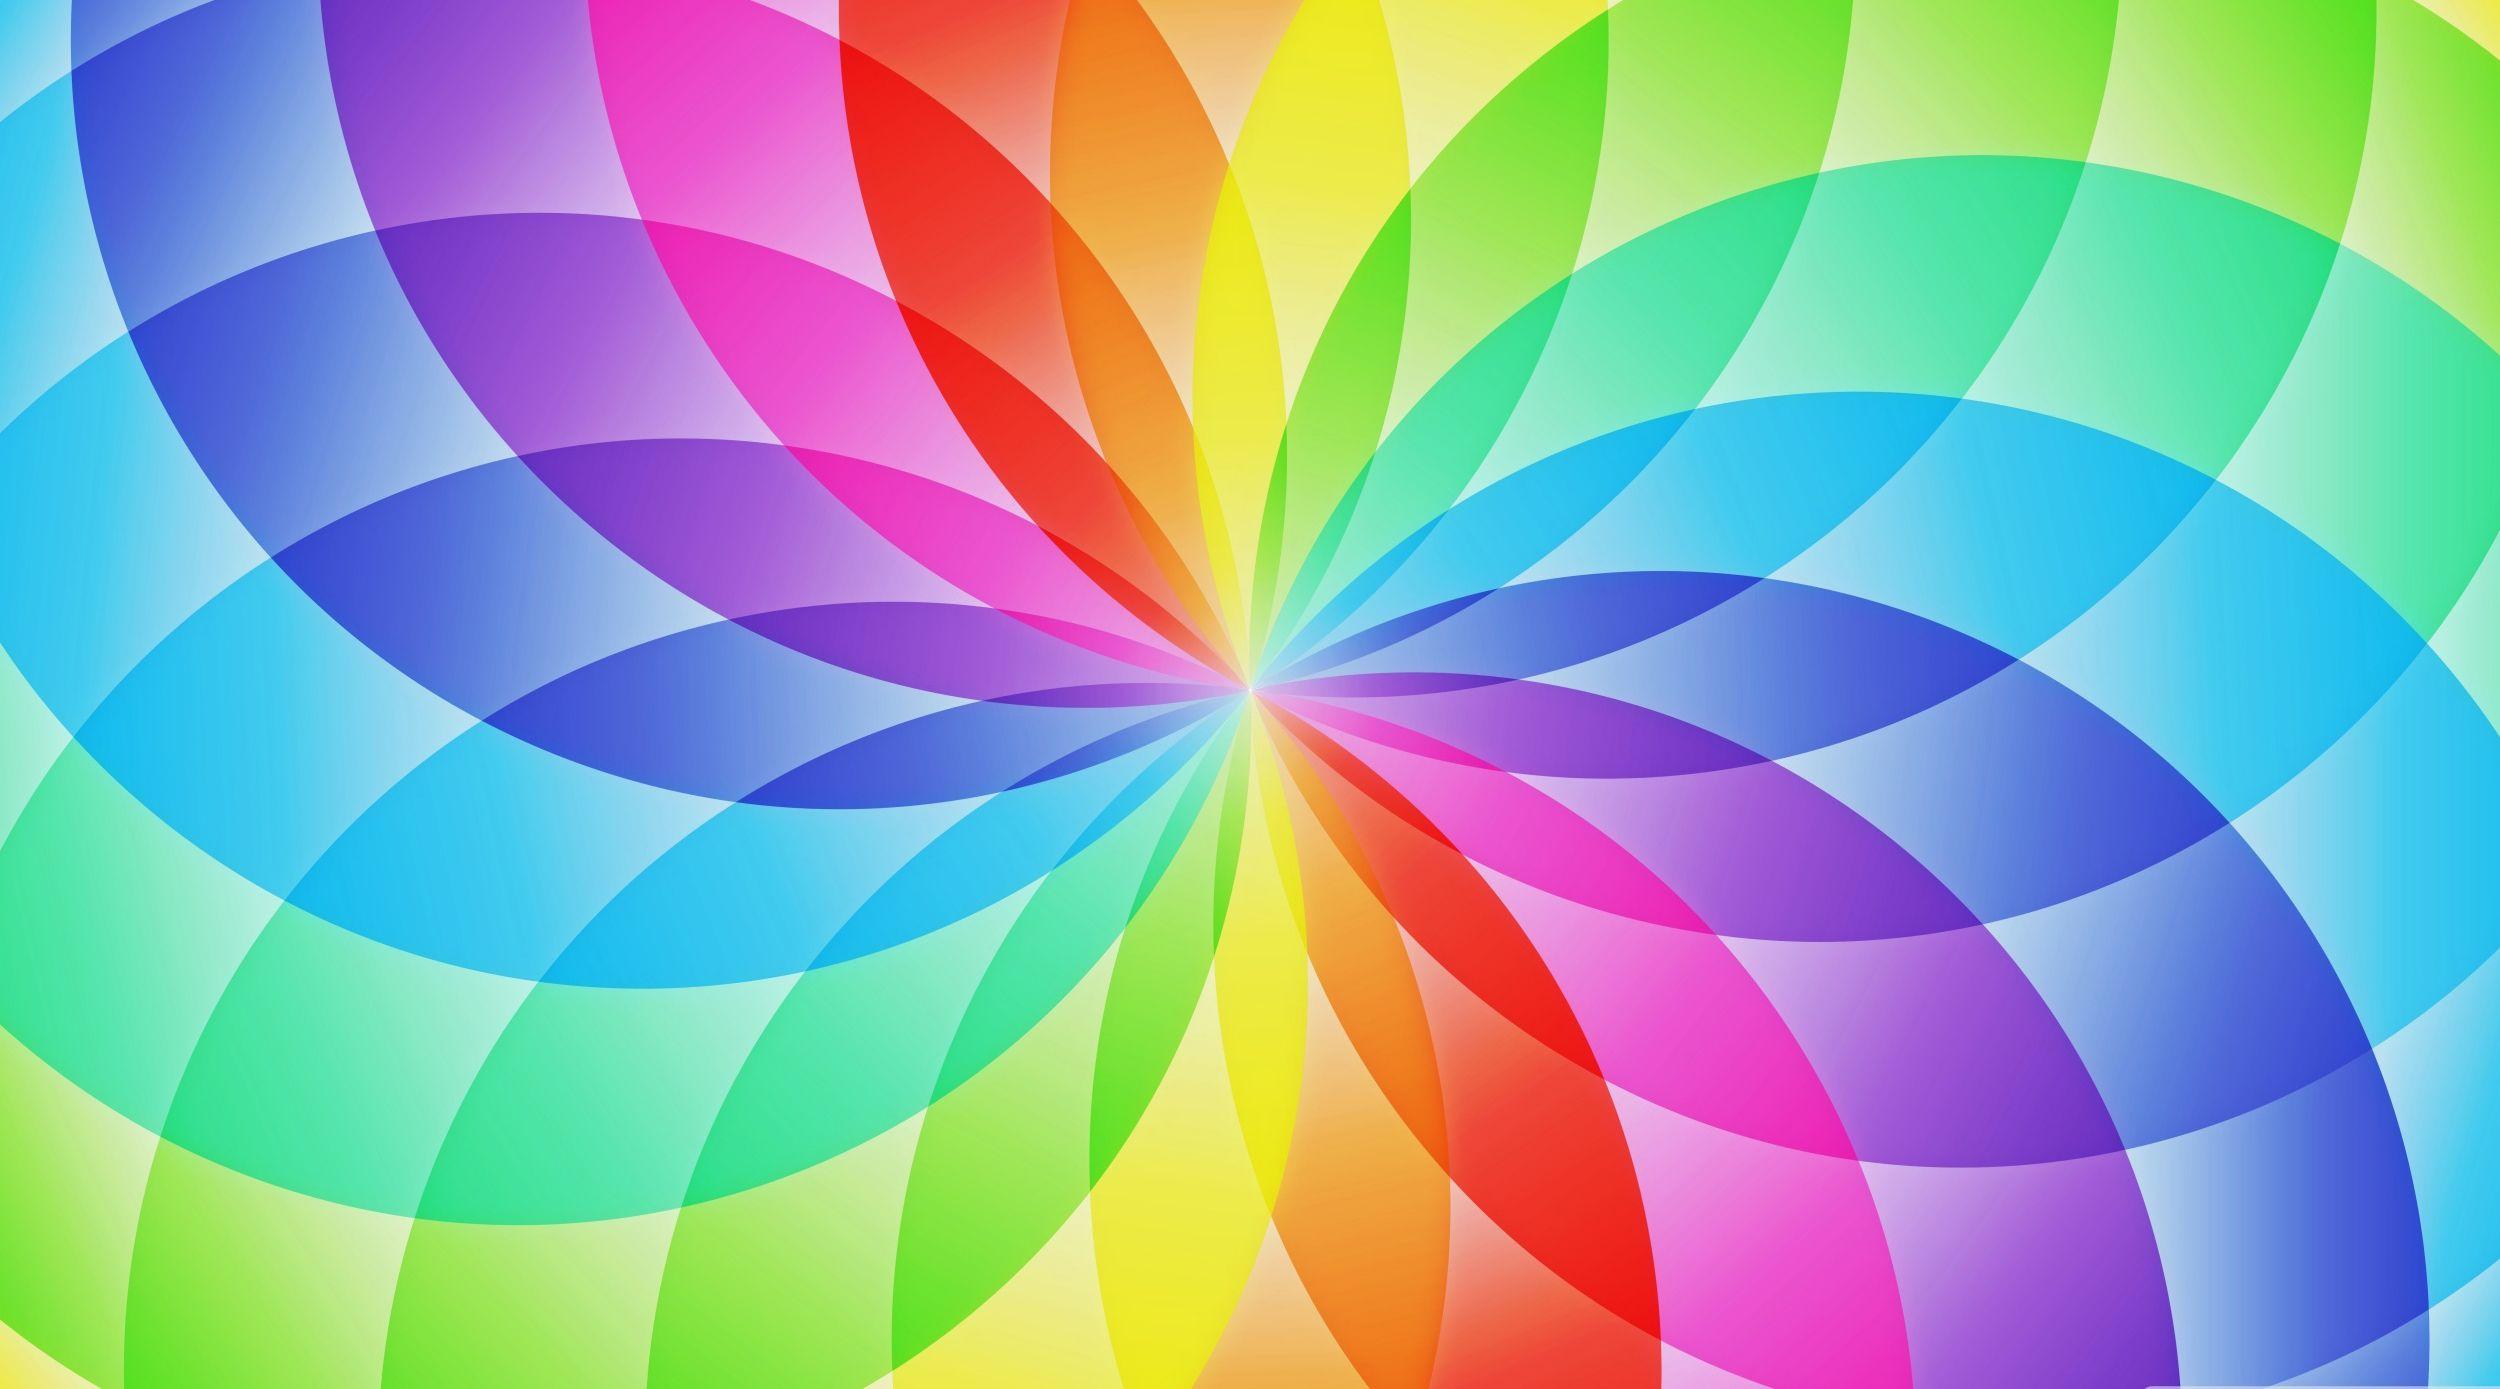 Rainbow Flowers Desktop Background Wallpapers High Resolution